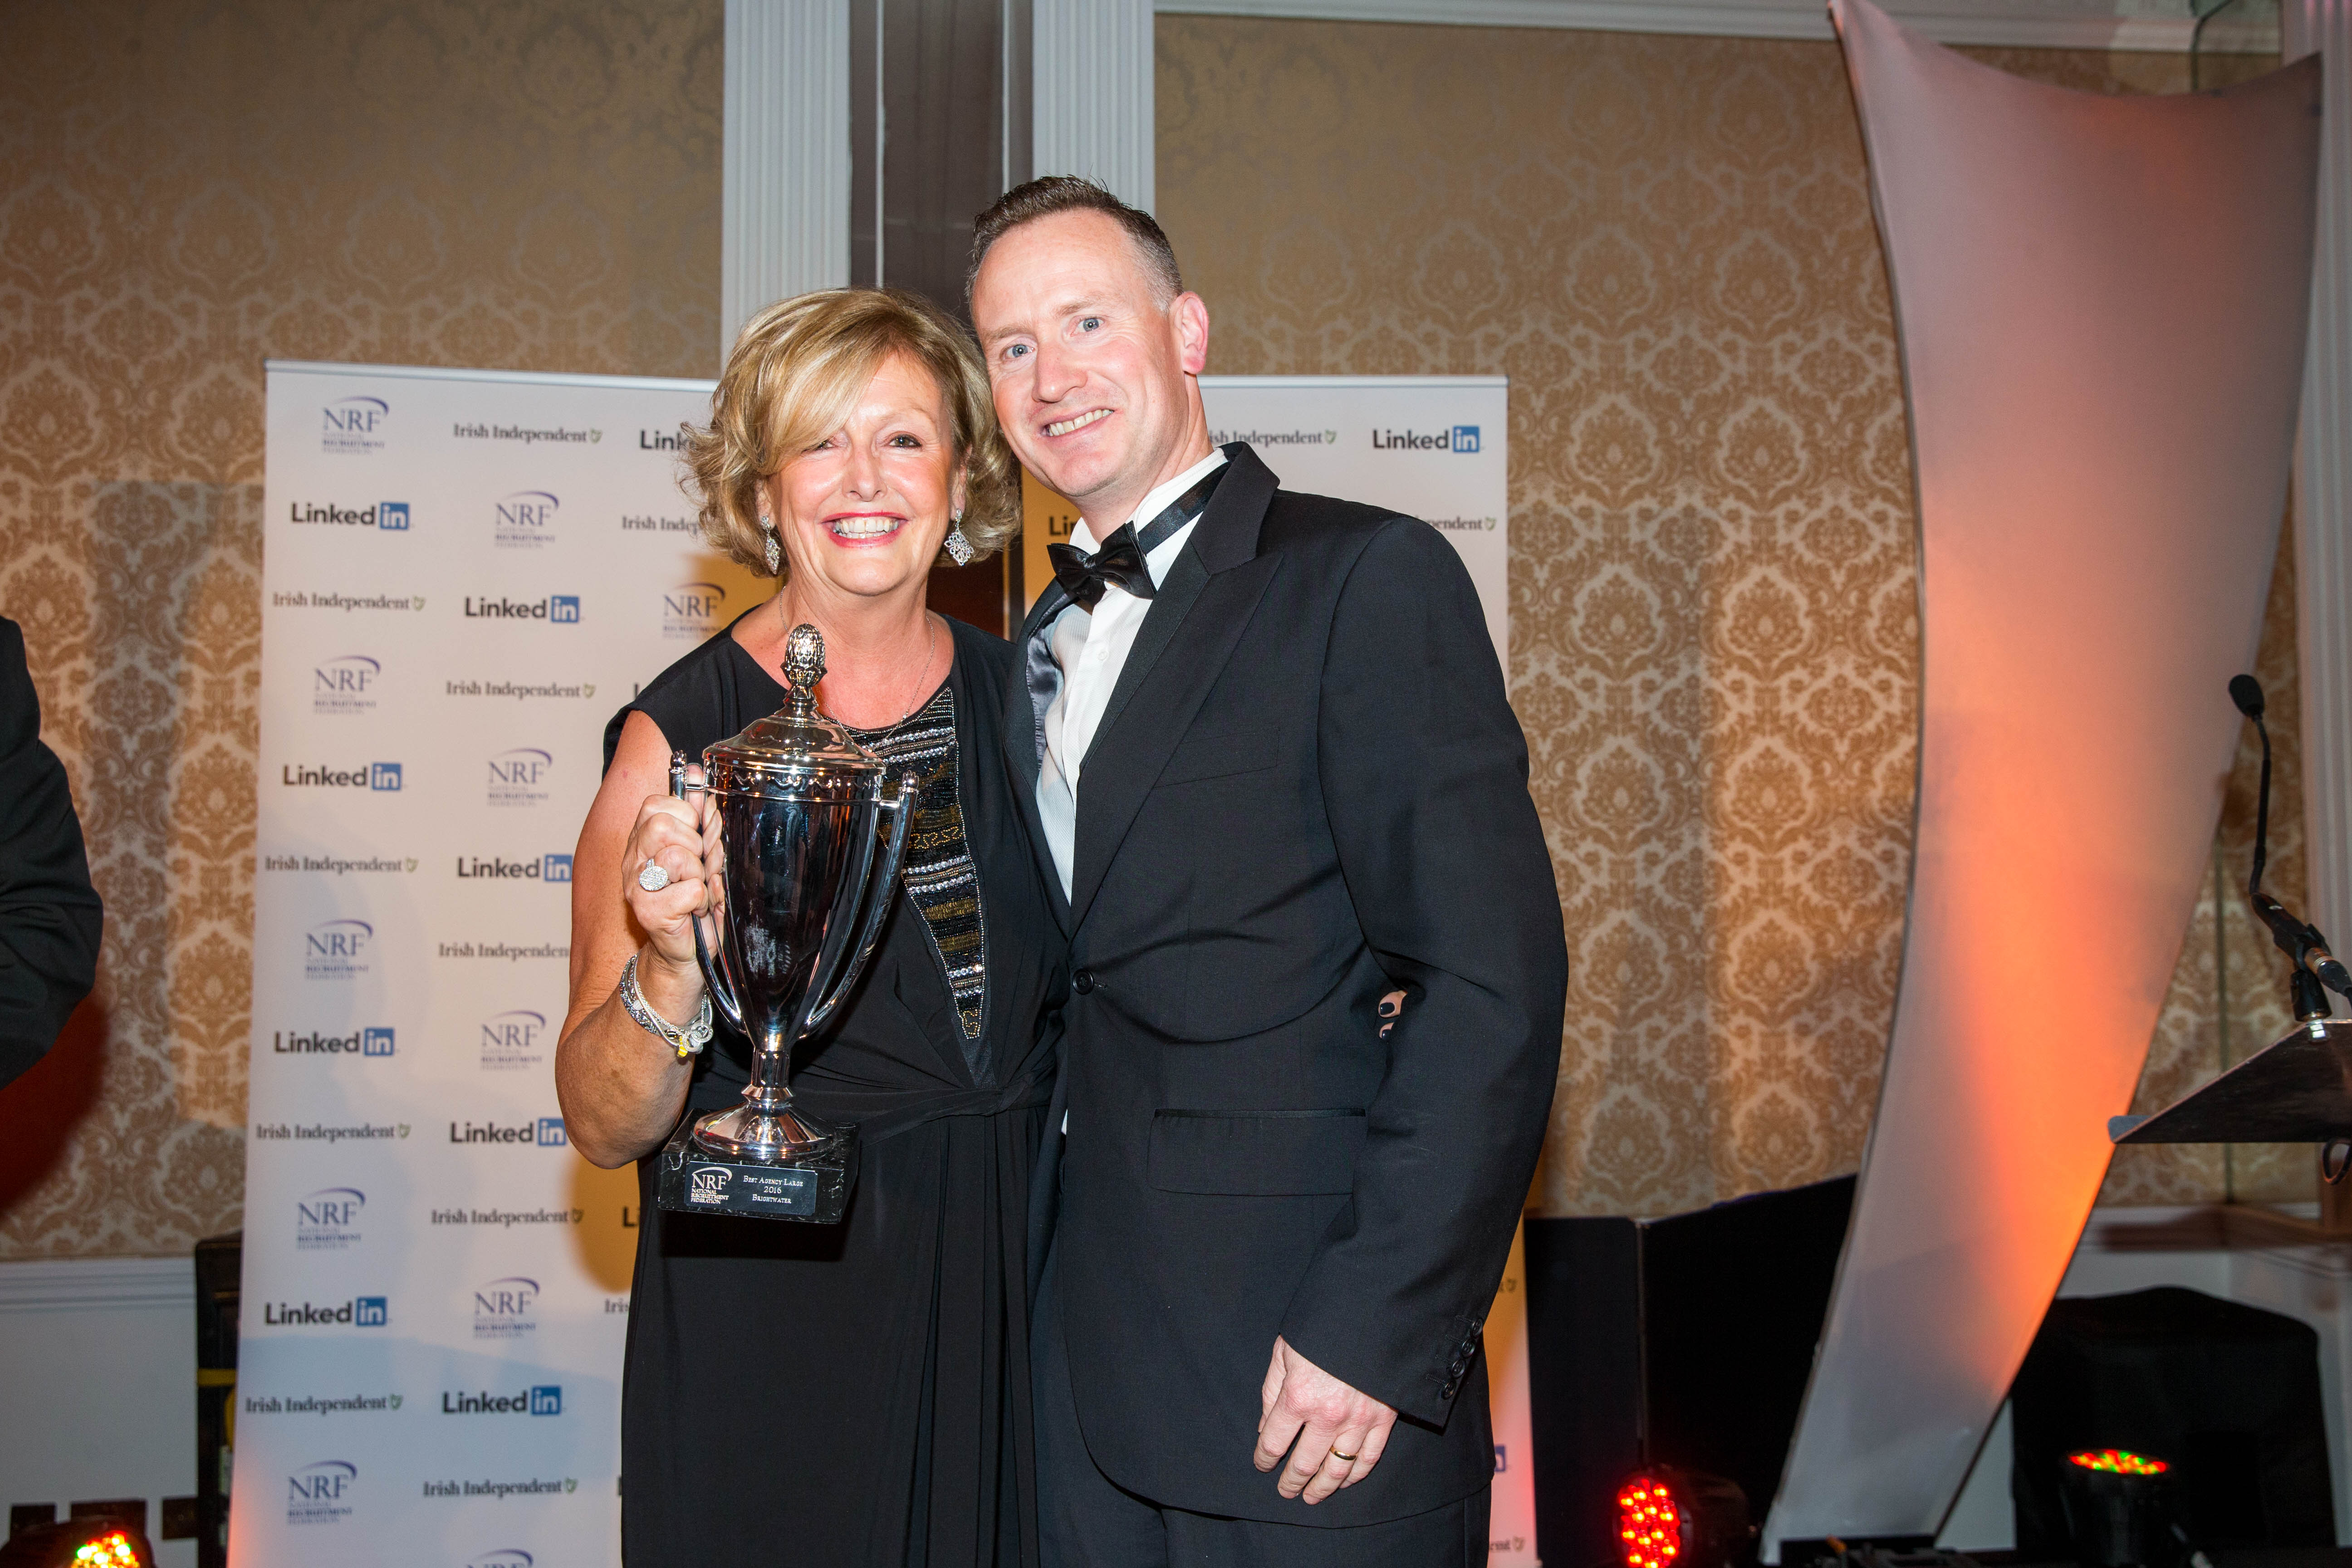 Barbara McGrath, MD & John O'Donnell at the NRF Awards